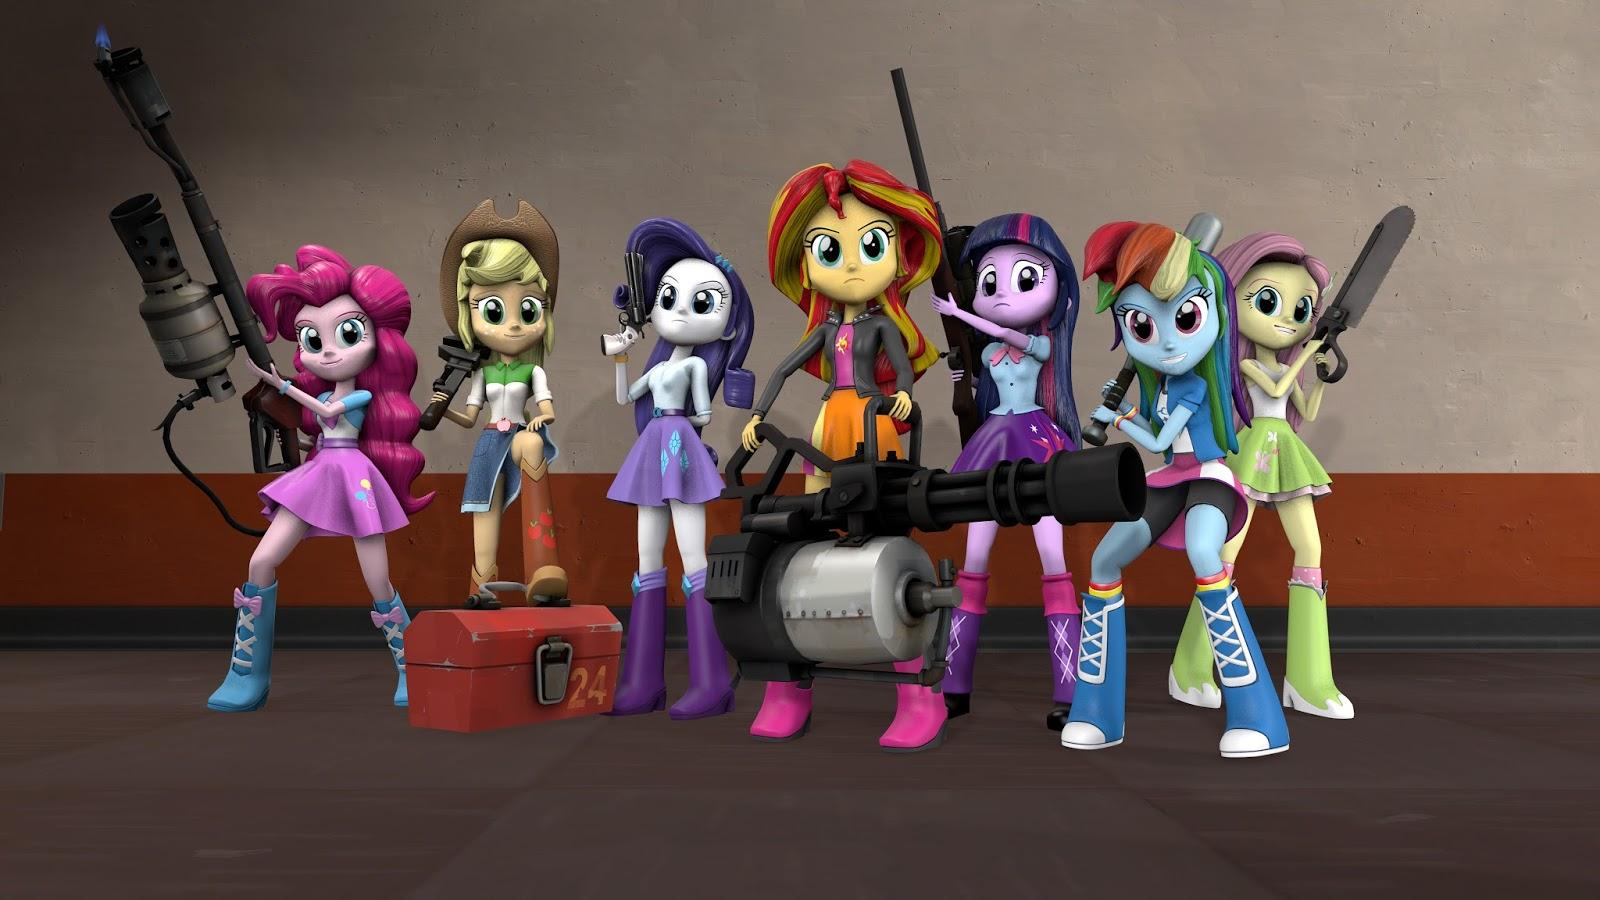 Mlp Stuff Gmod Sfm 3d Art Compilation: MLP Stuff!: Source Equestria Girls Pack